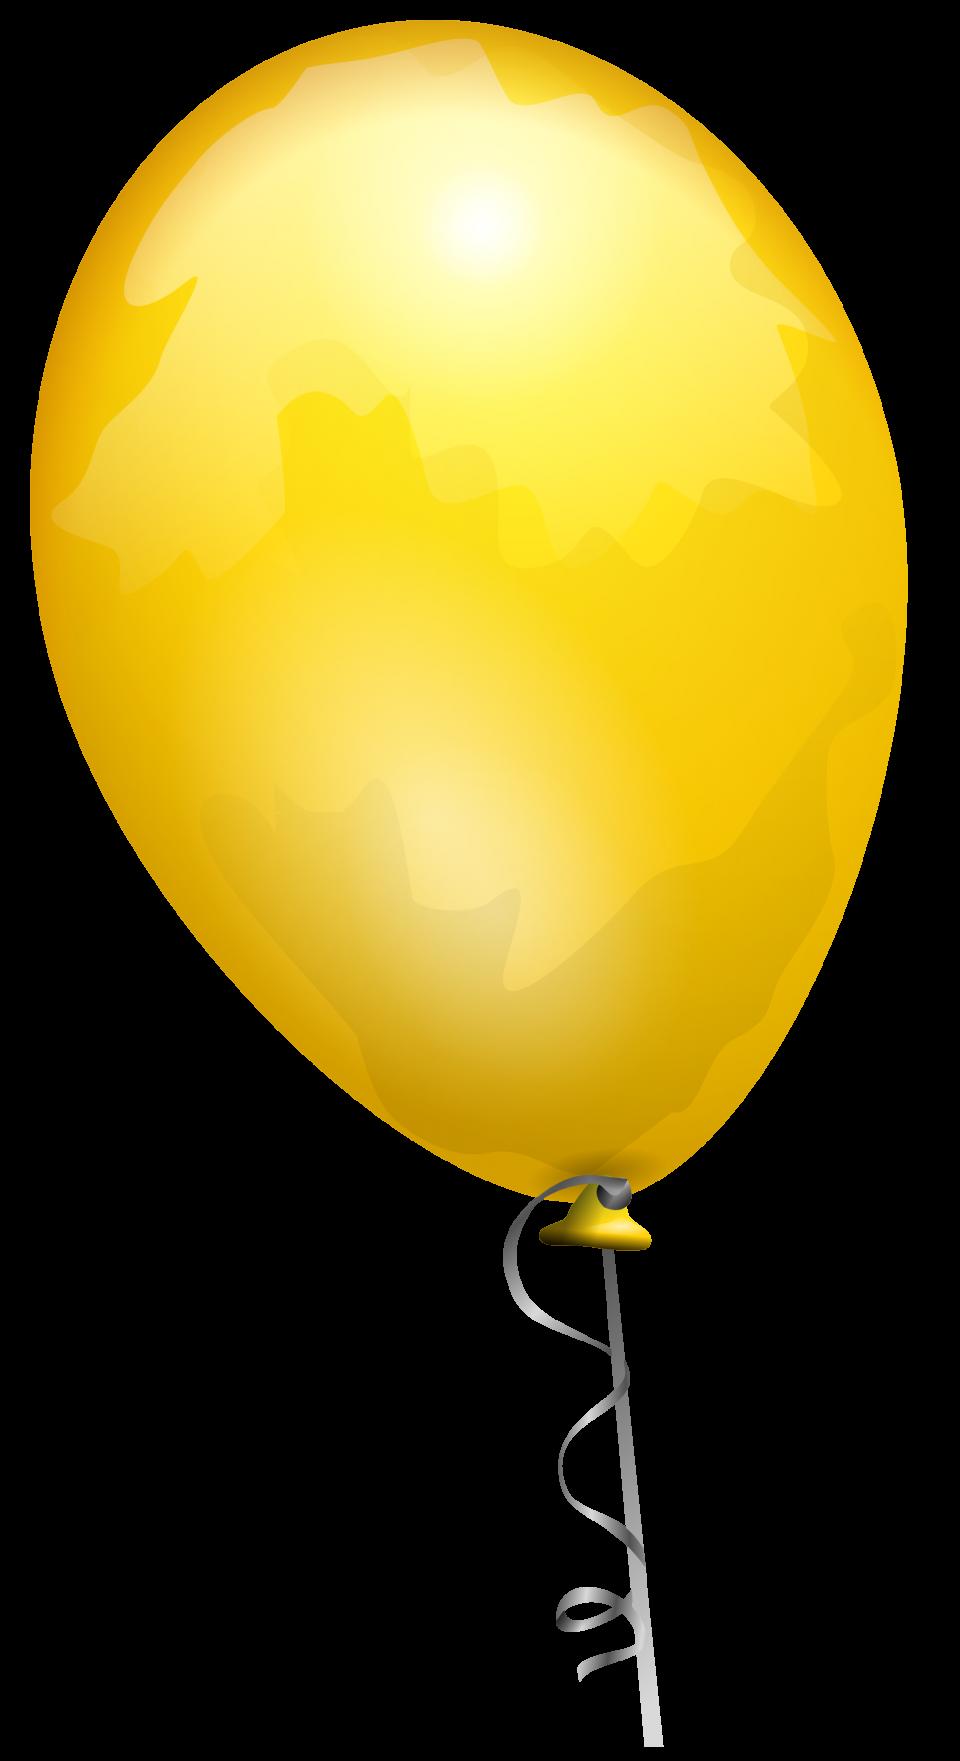 Yellow Party Ballon PNG Image